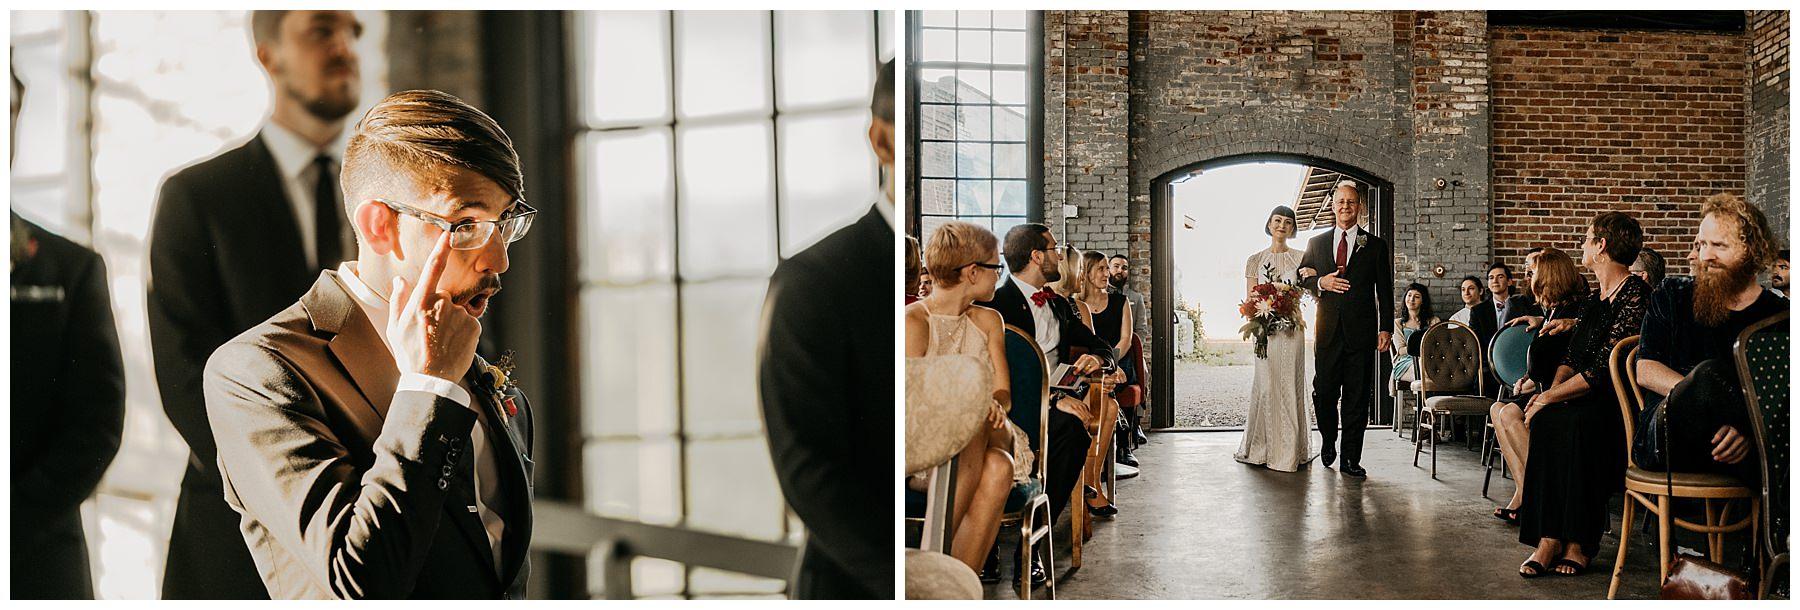 Jon and Jen New York Wedding-101.jpg